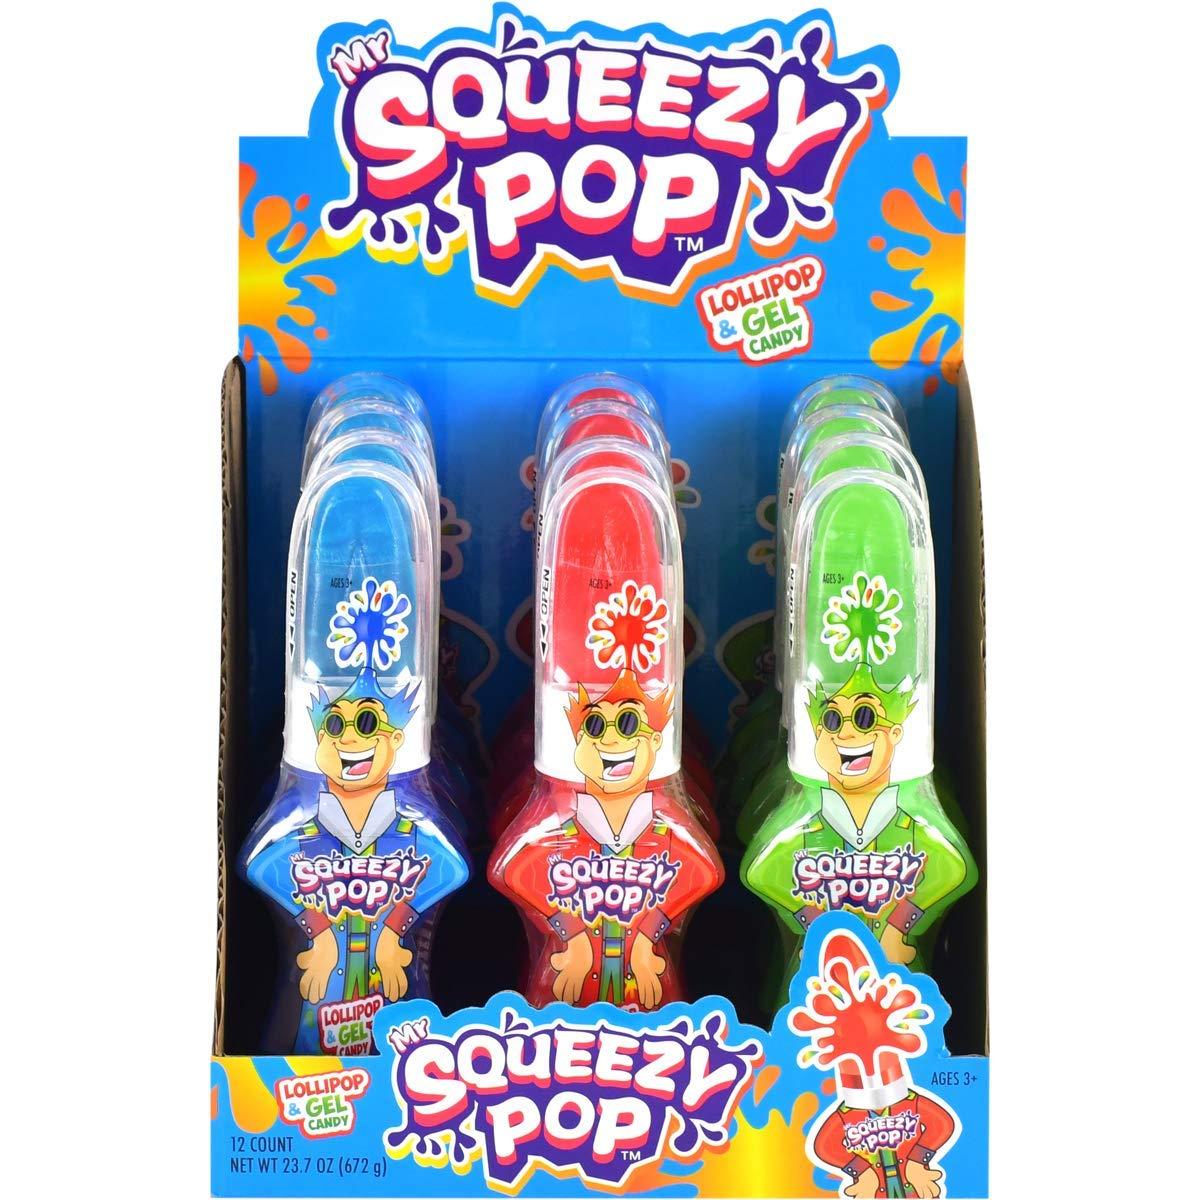 Koko's Mr. Squeezy Pop Lollipop Candy, 1.97 oz (56 g) - 12 Count Display Box